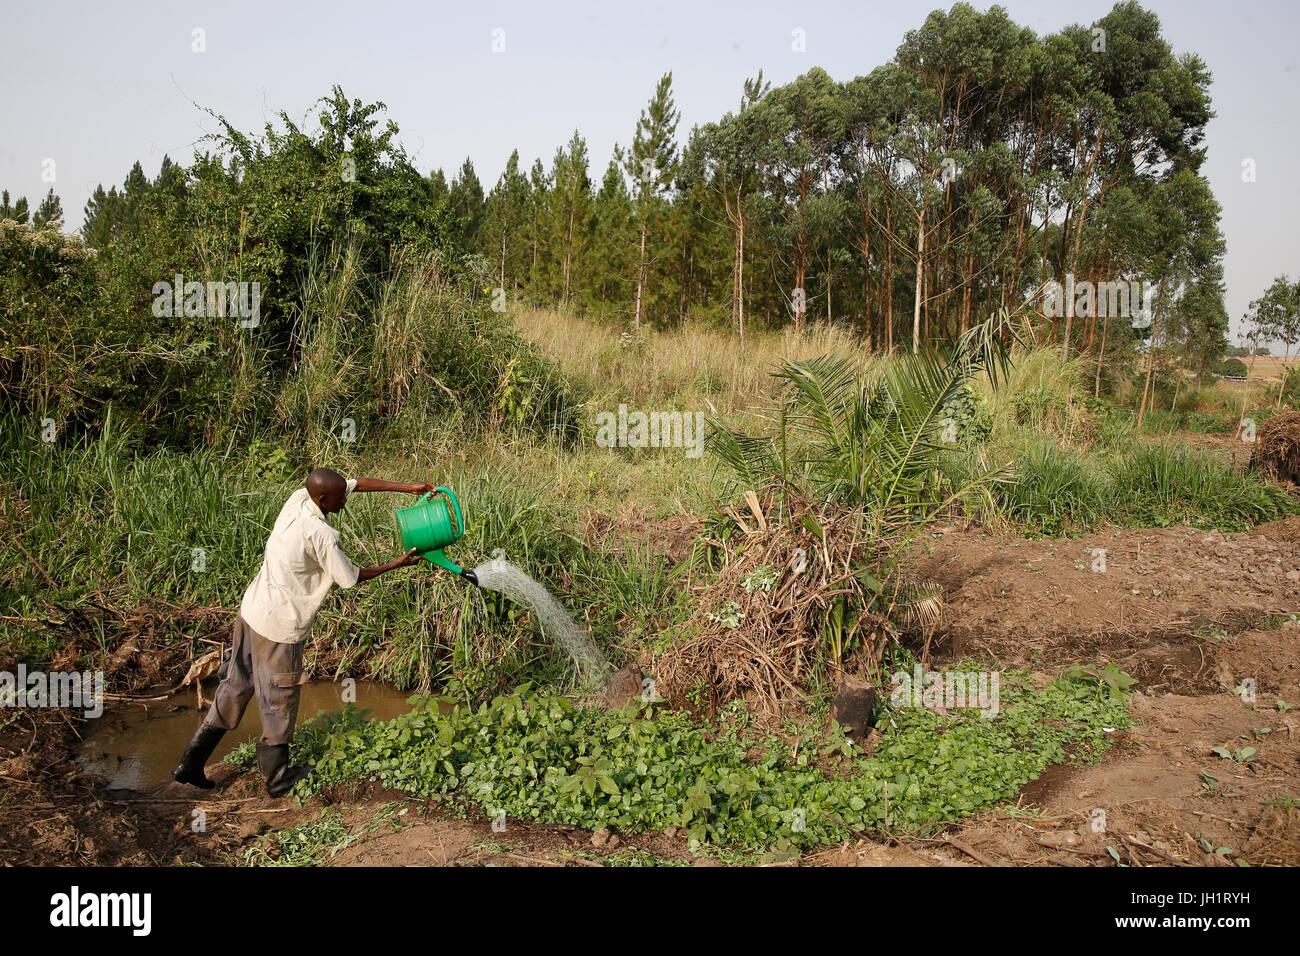 Farmer Apollo Byarunga received 2 loans from ENCOT microfinance. Uganda. - Stock Image